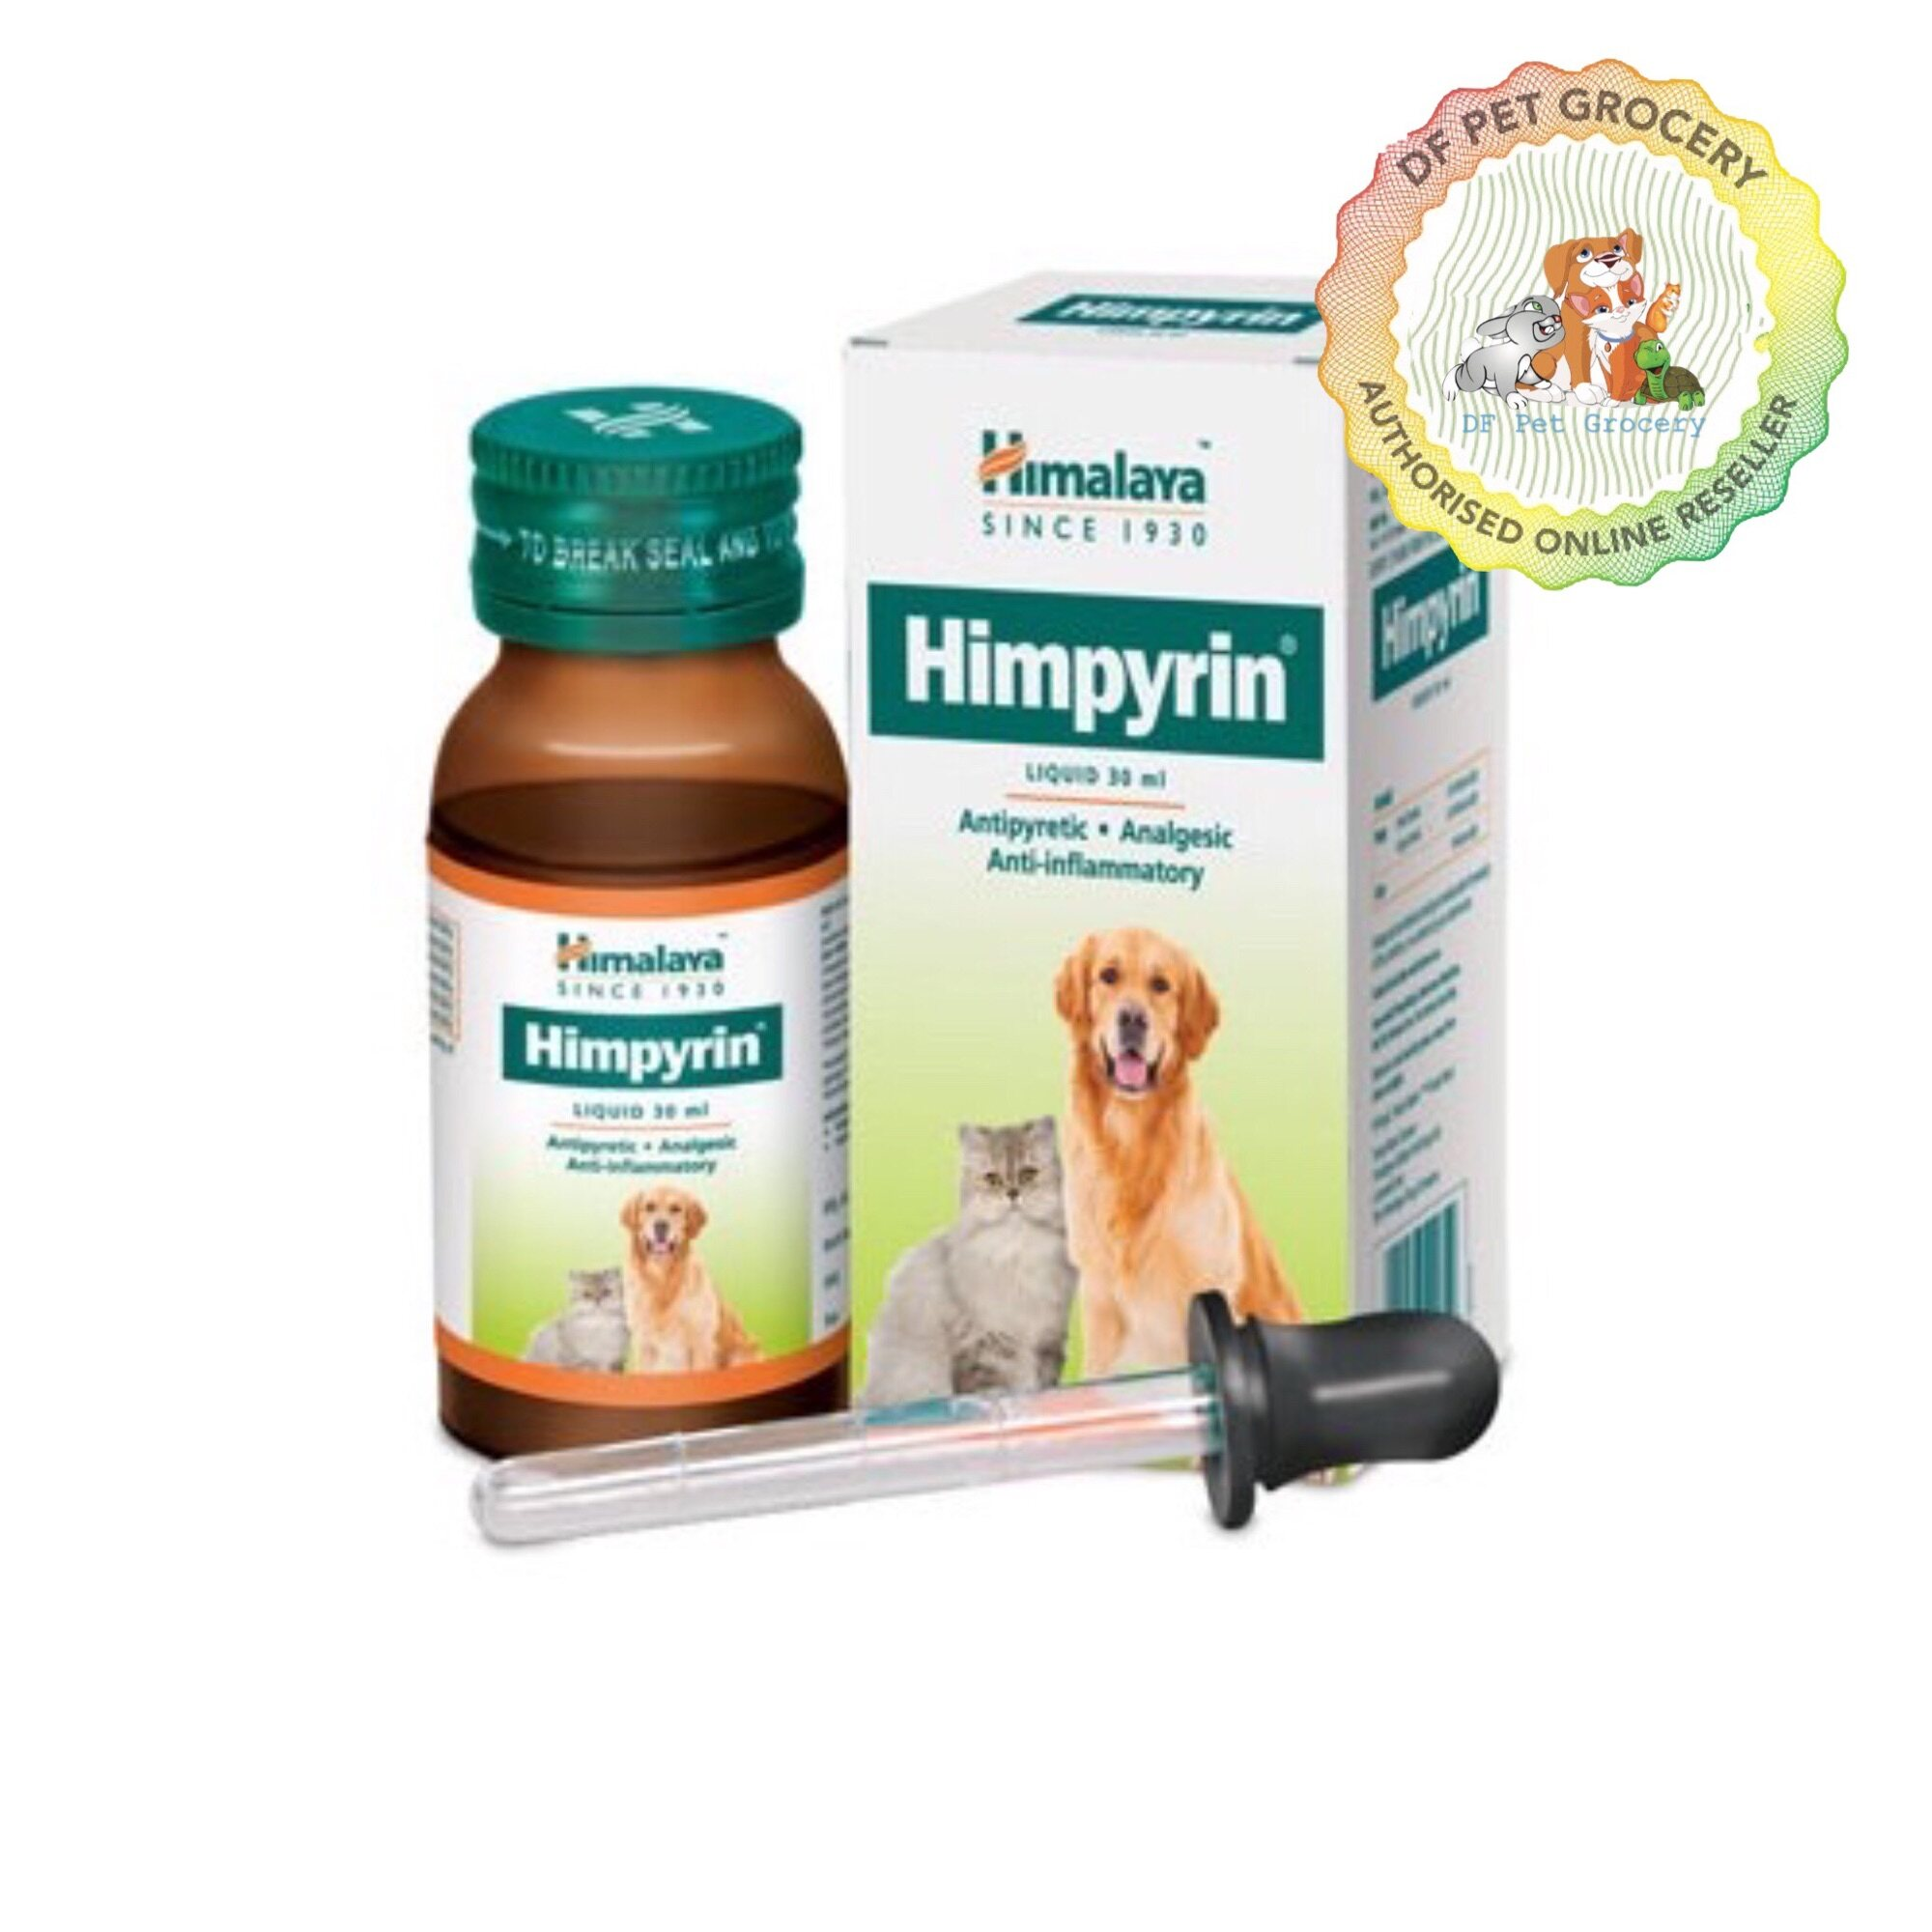 Himalaya Himpyrin Liquid 30ml for Cats and Dogs Fever & Painful  - Ubat Demam